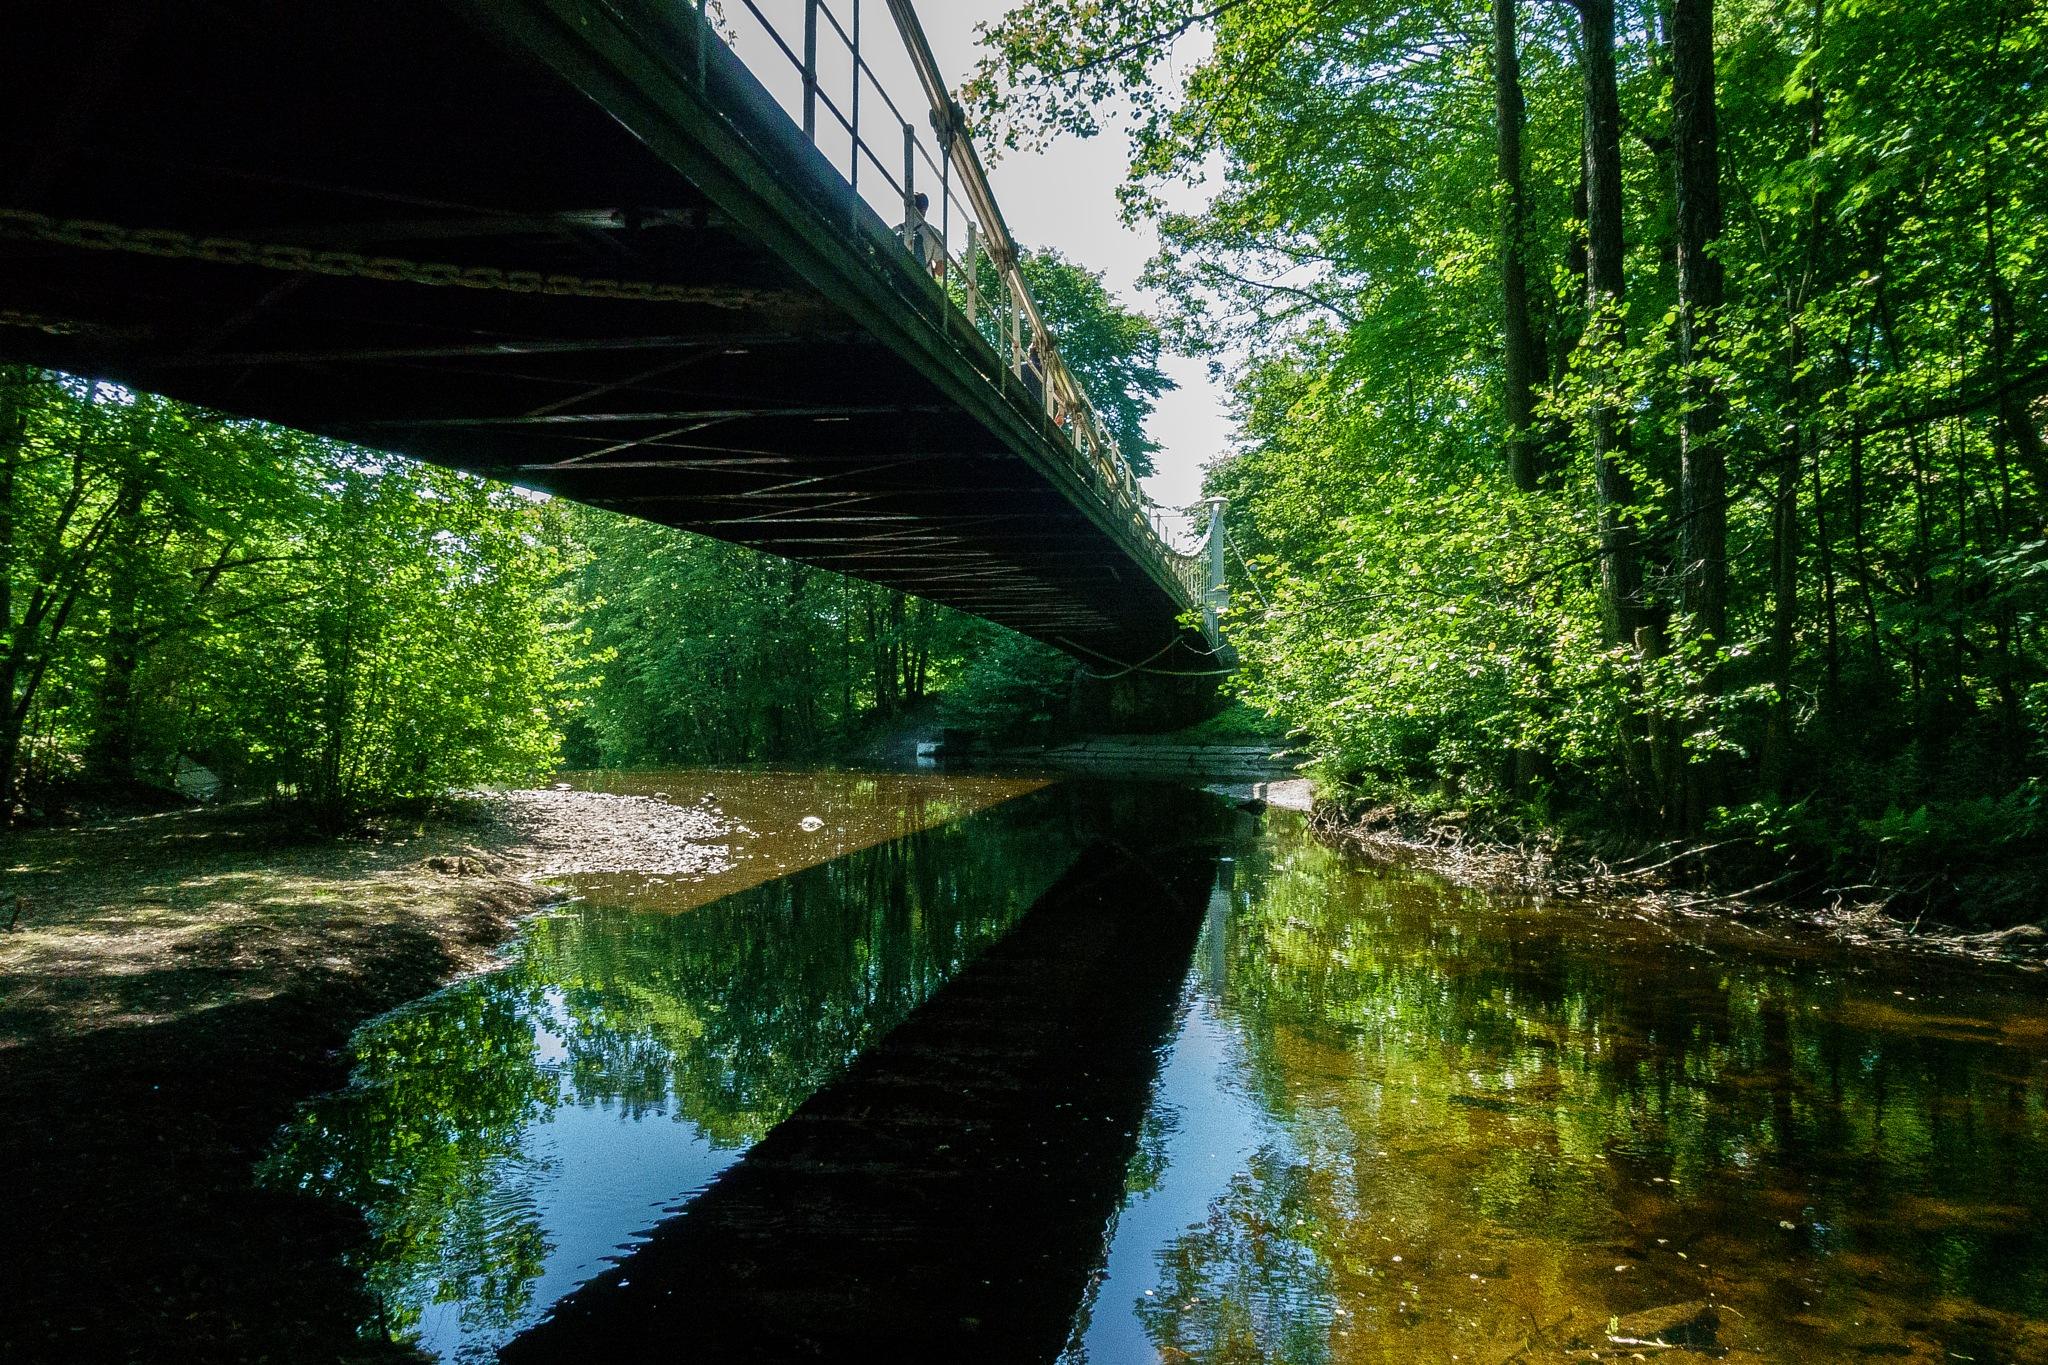 Bridge over still water  by JonArneFoss